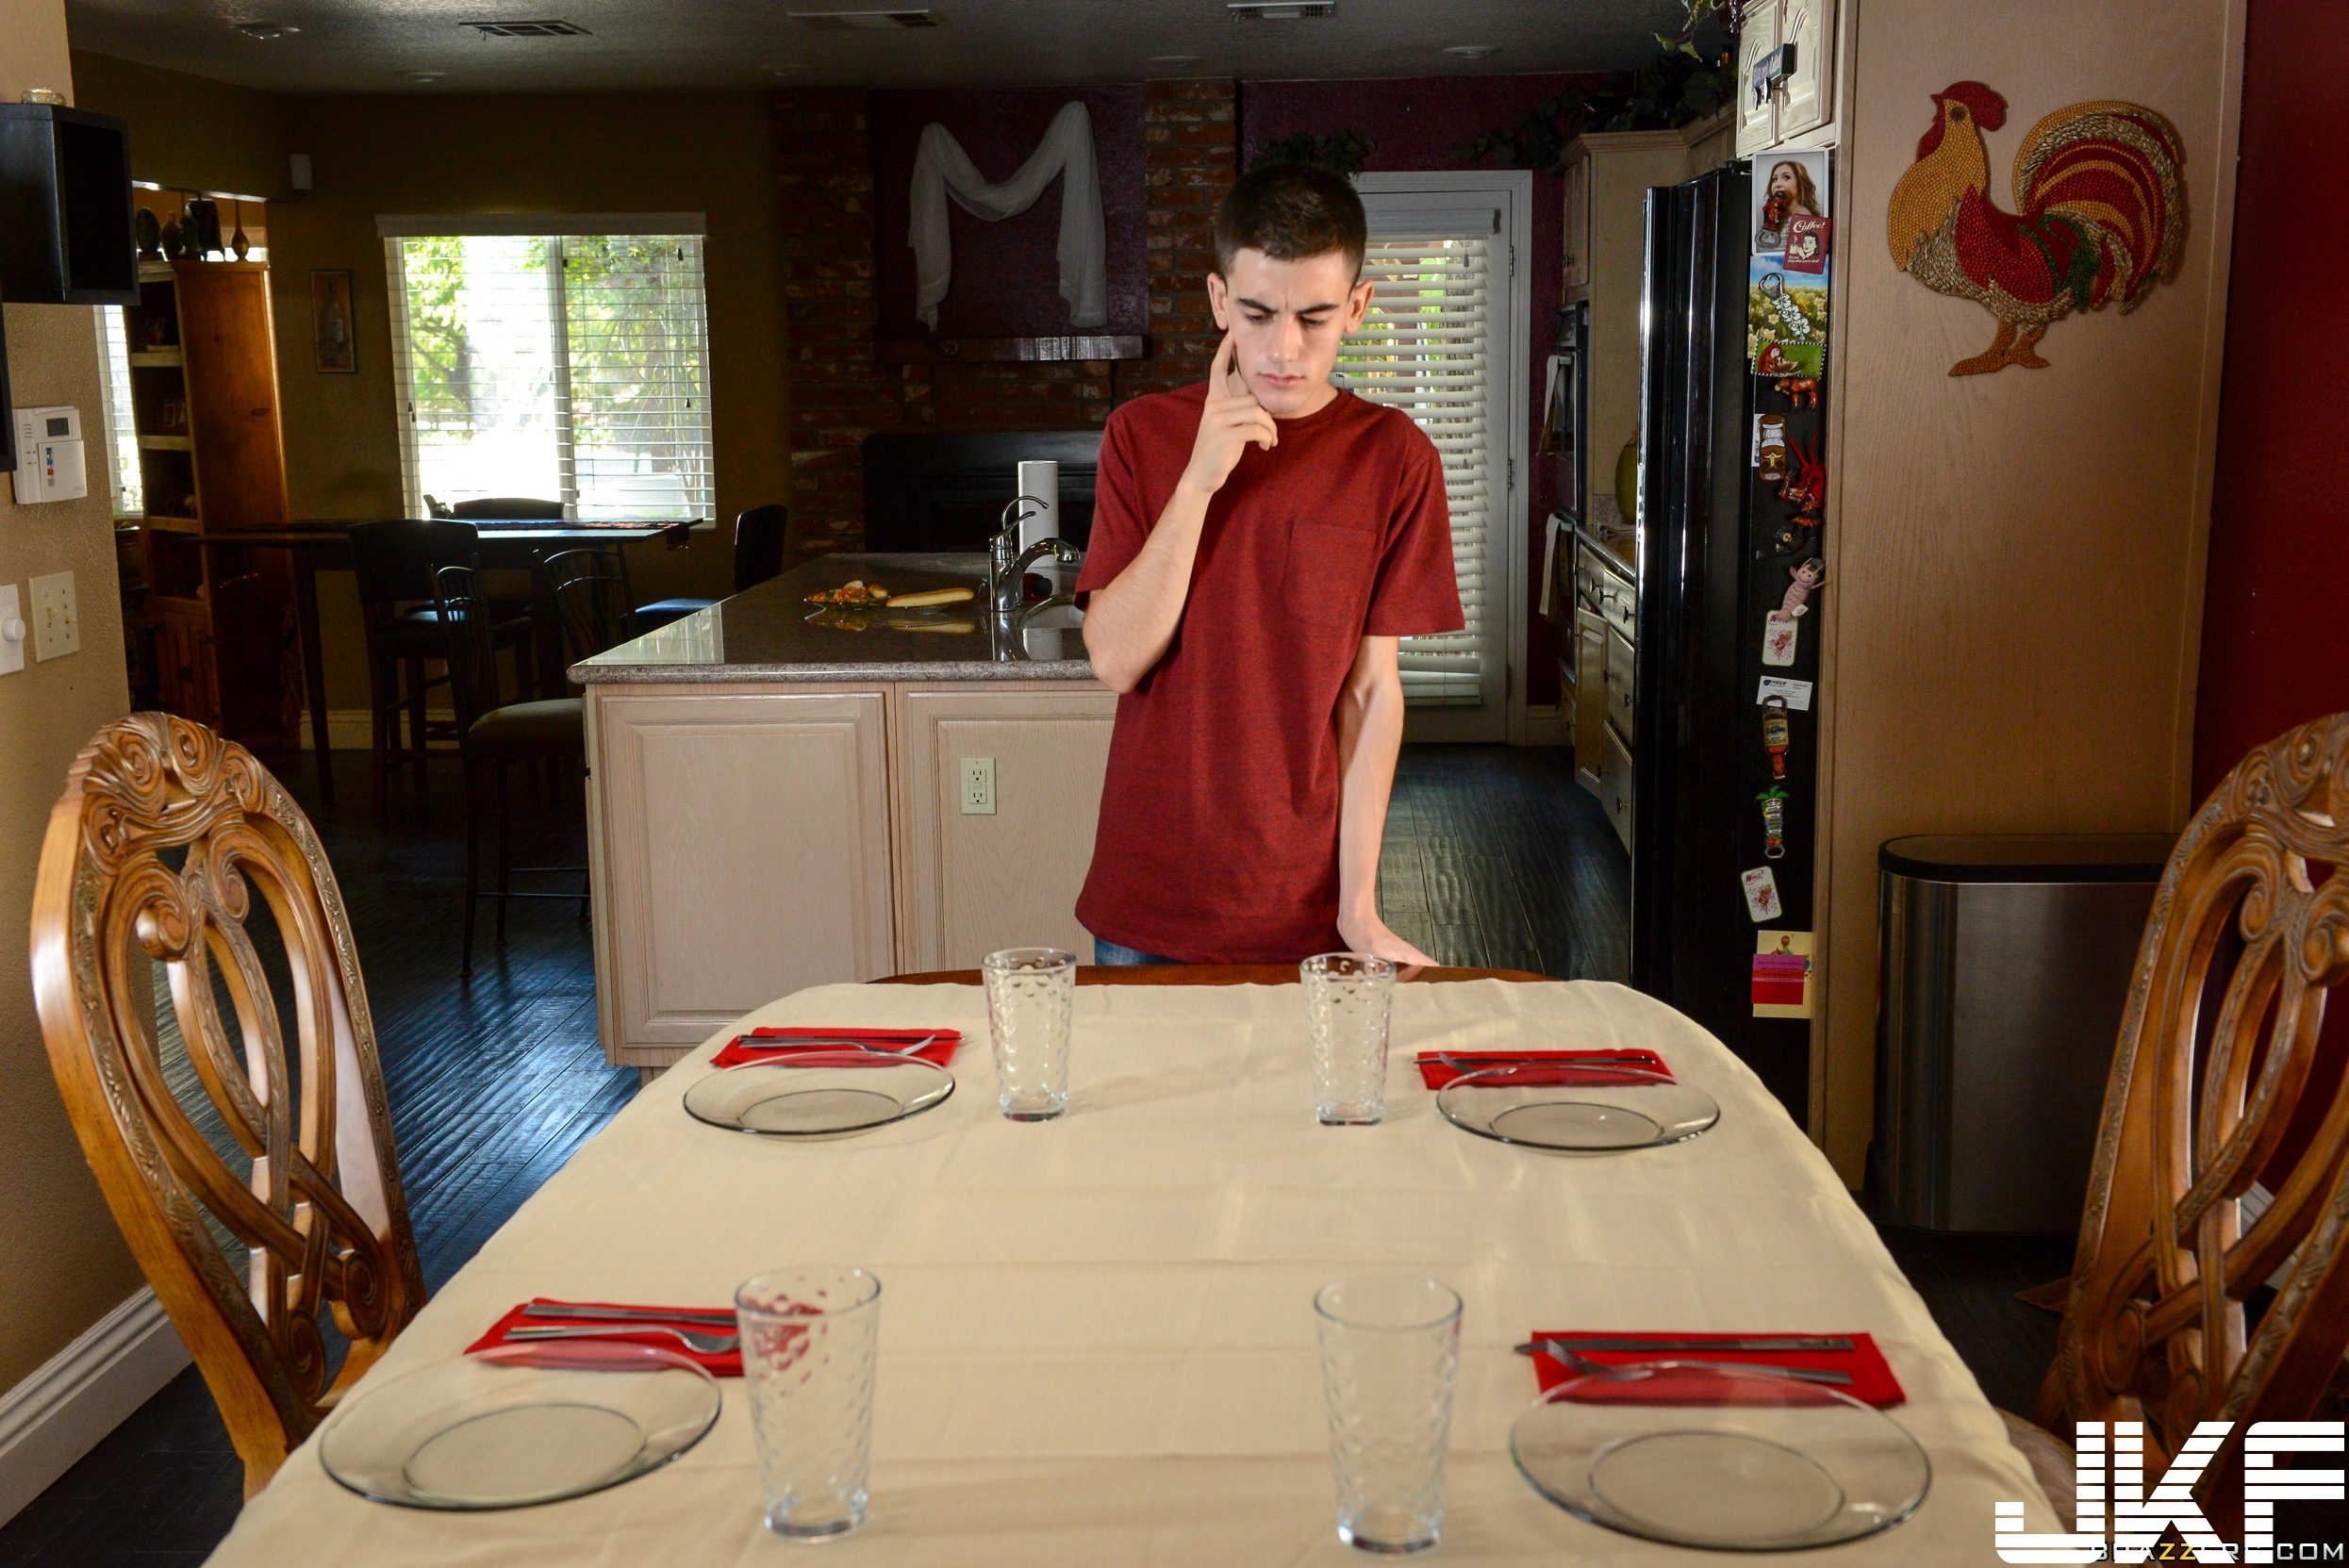 2565271_TeensLikeItBig.com Karlie Brooks Doing The Dishes (Feb 20, 2017)_174.jpg